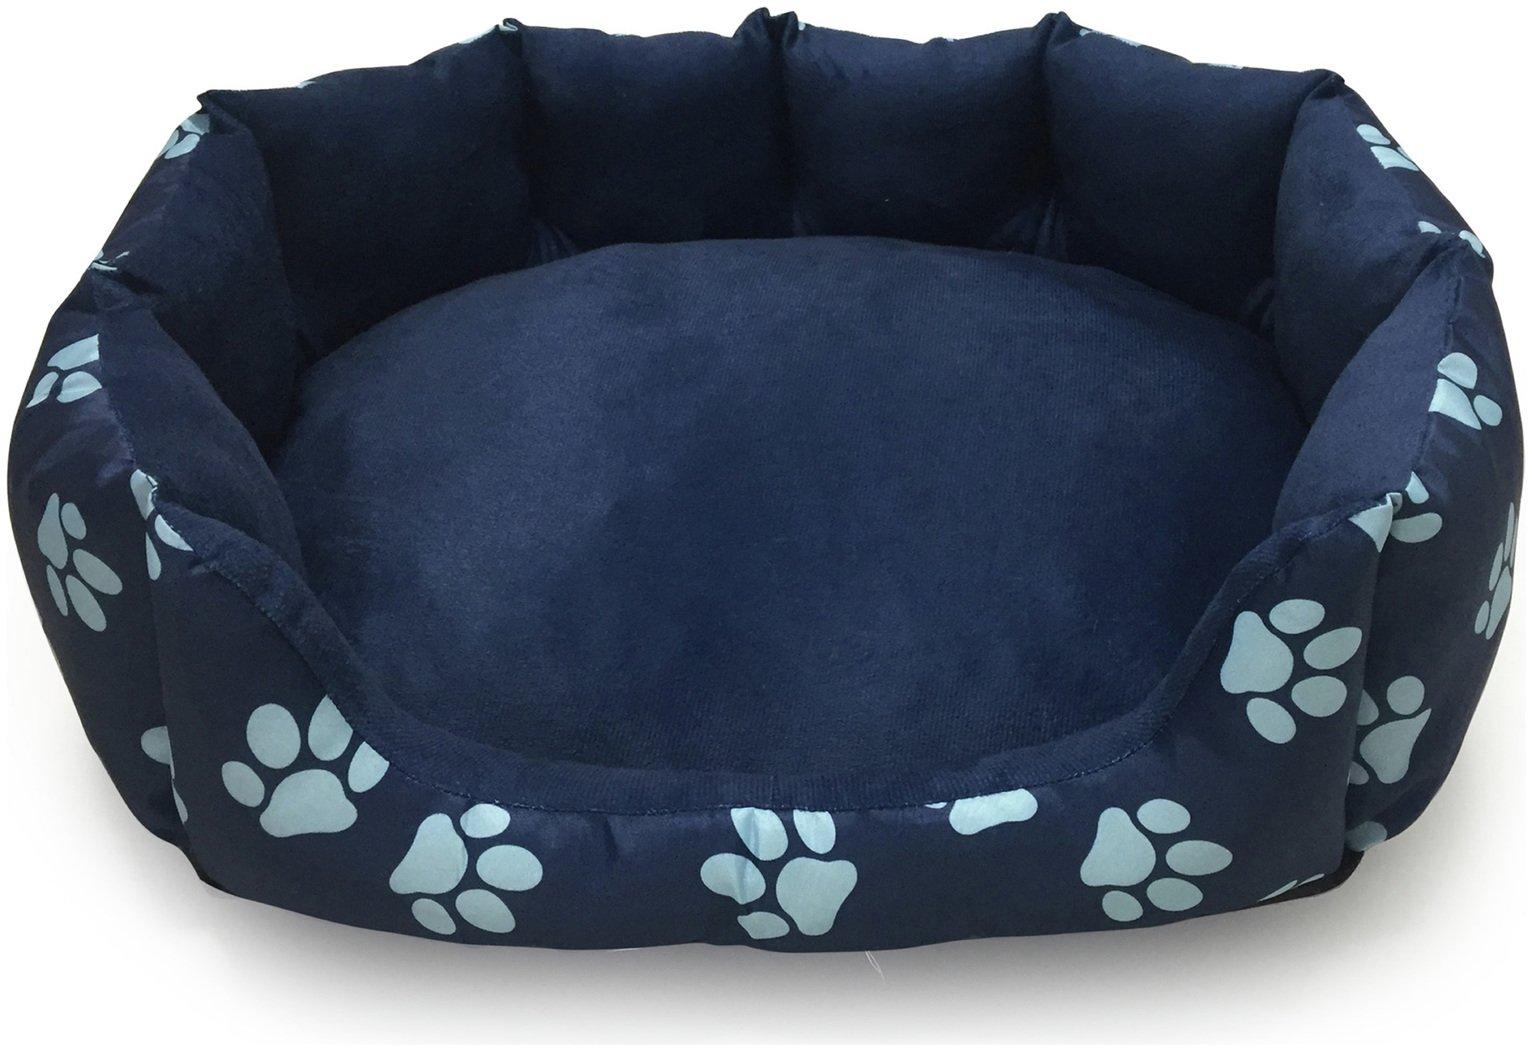 Paw Print Fleece Oval Navy Cushion - Medium